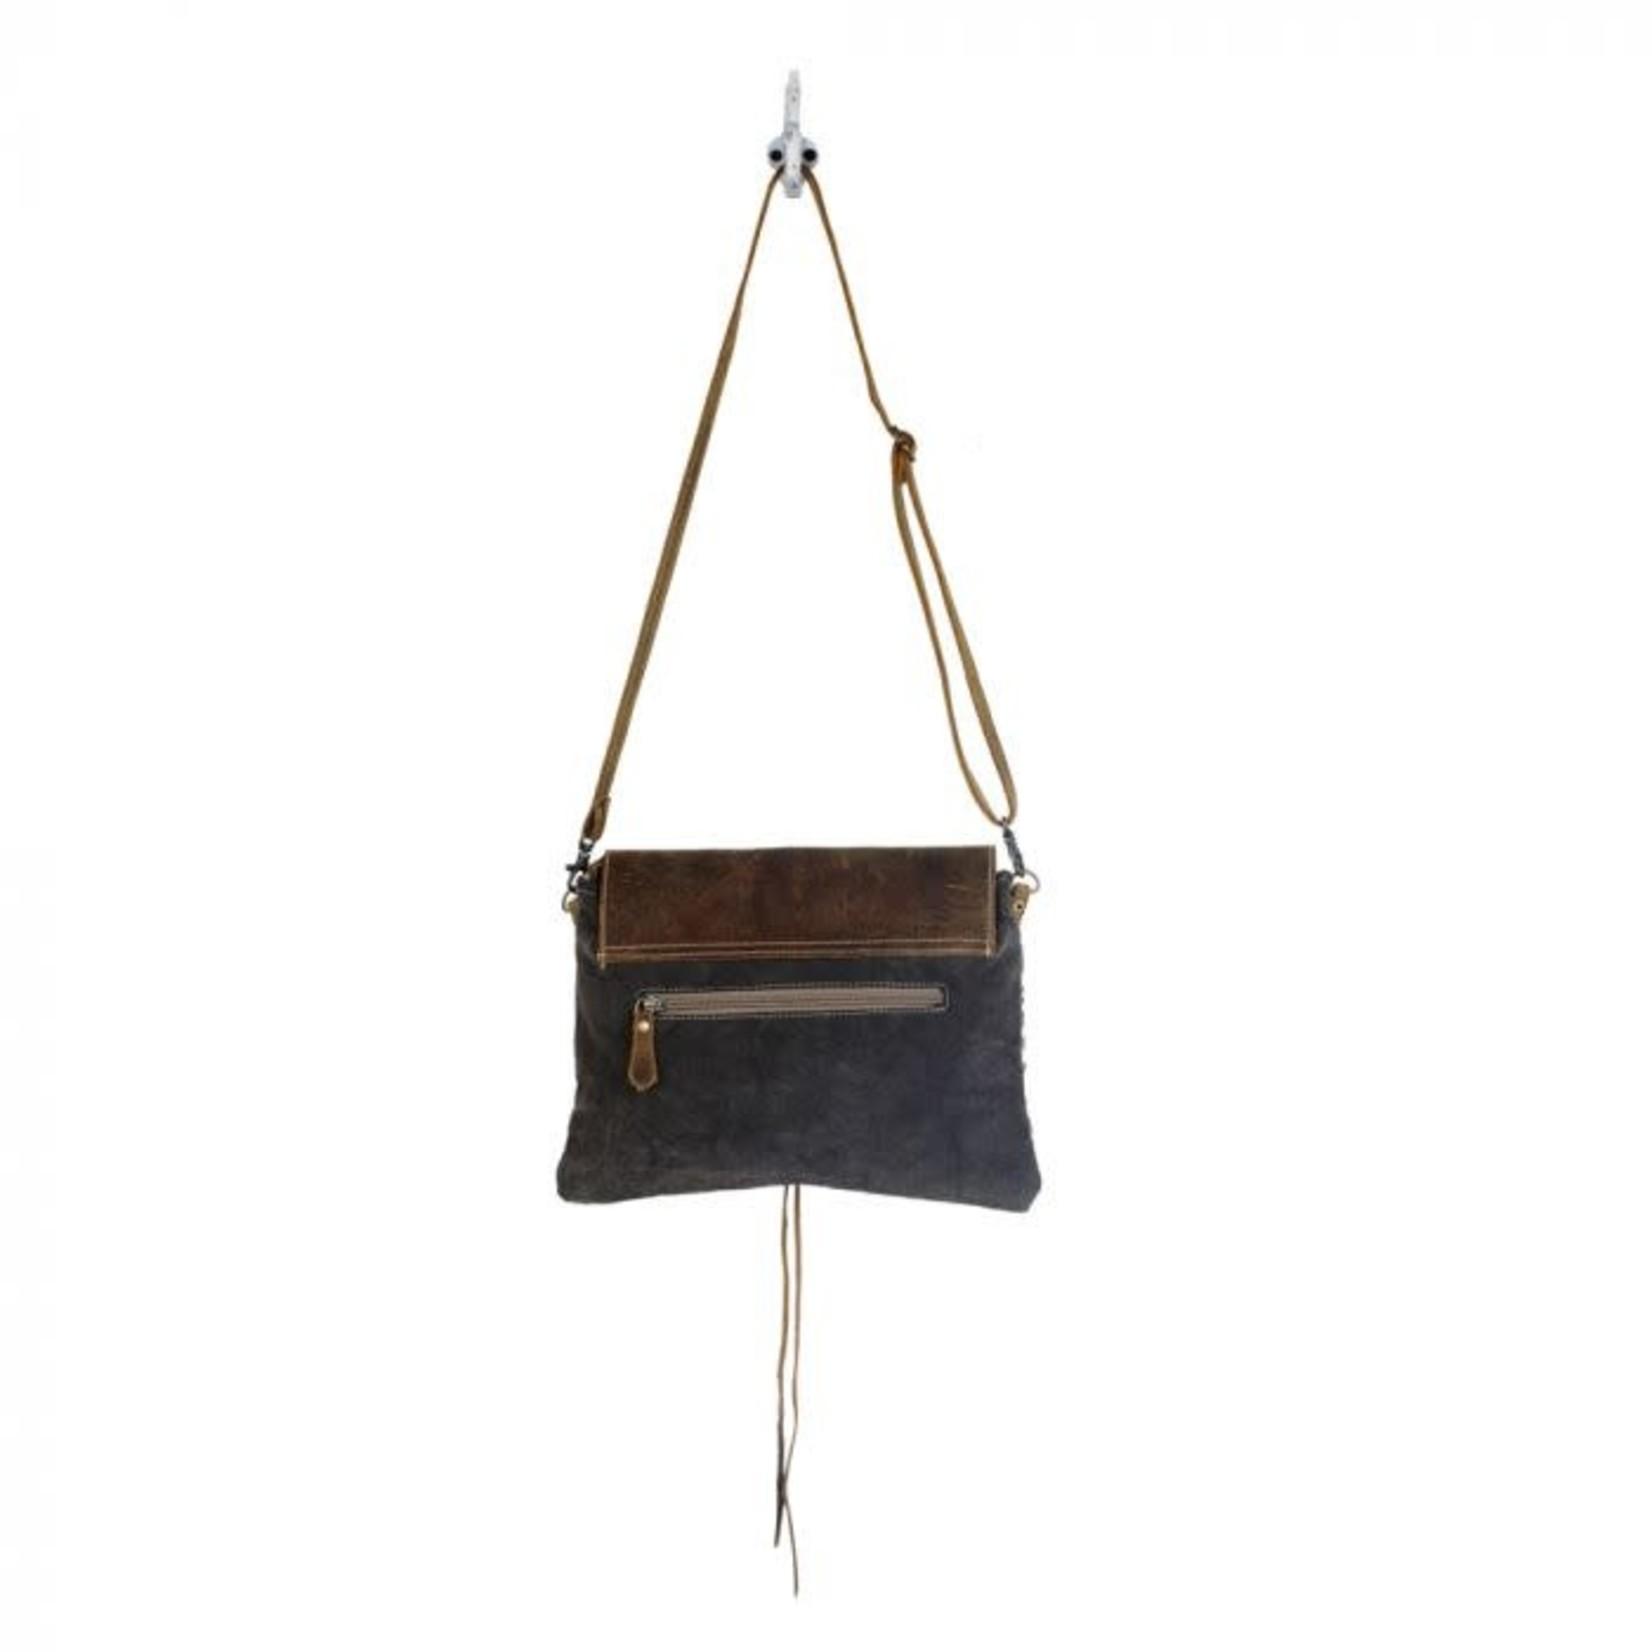 Myra Bag: Ivy Patterned Small Crossbody Bag